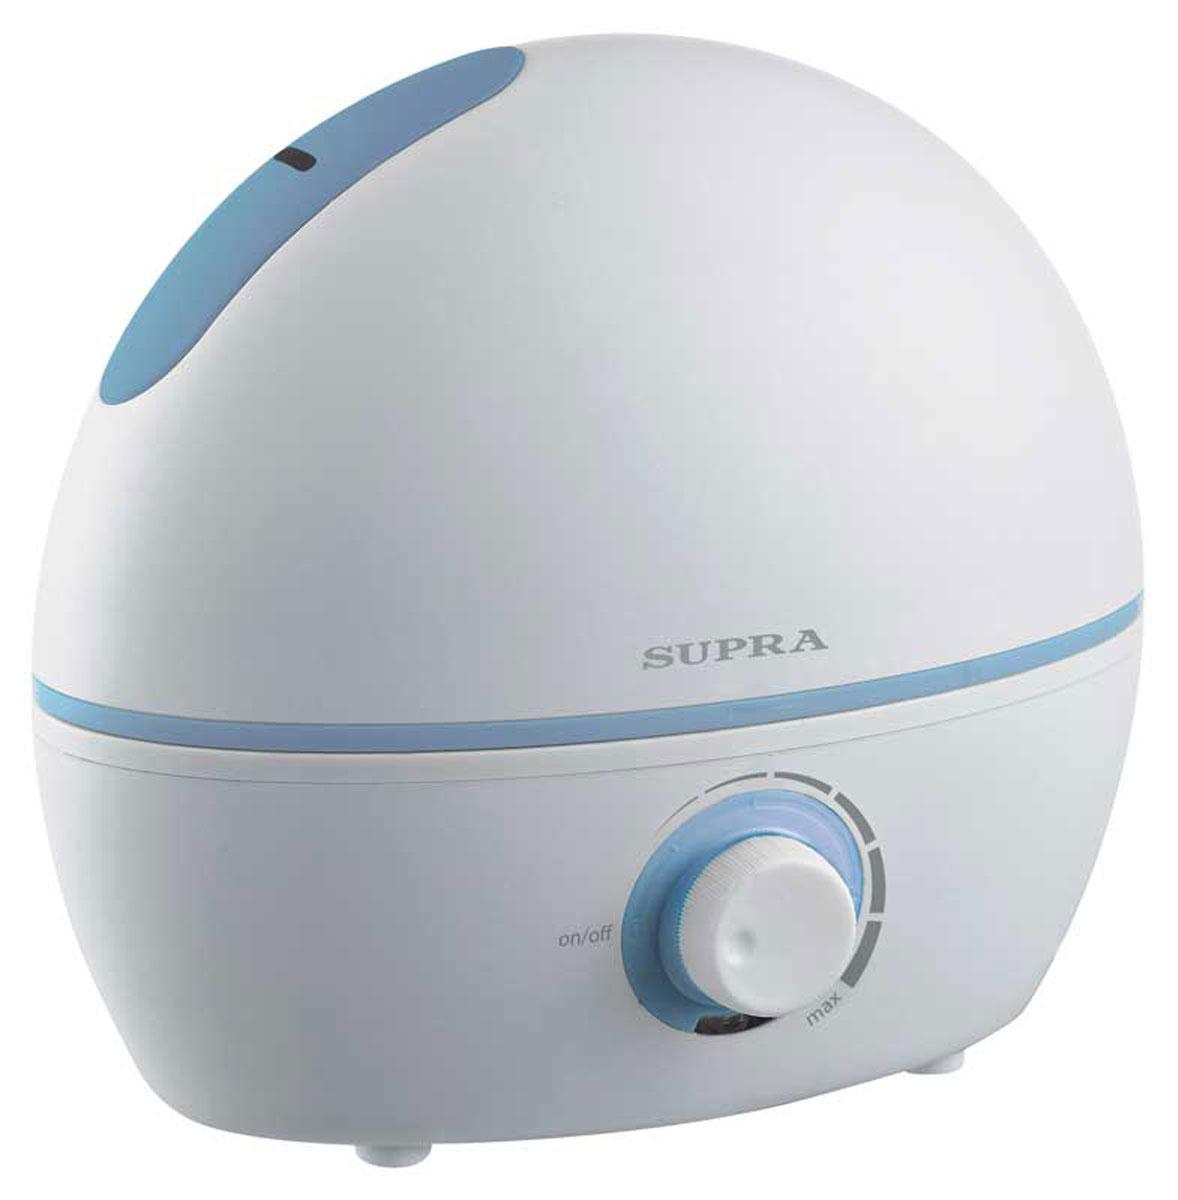 Supra HDS-102, White увлажнитель воздуха увлажнитель воздуха ультразвуковой 20 вт 4 л supra hds 114 blue